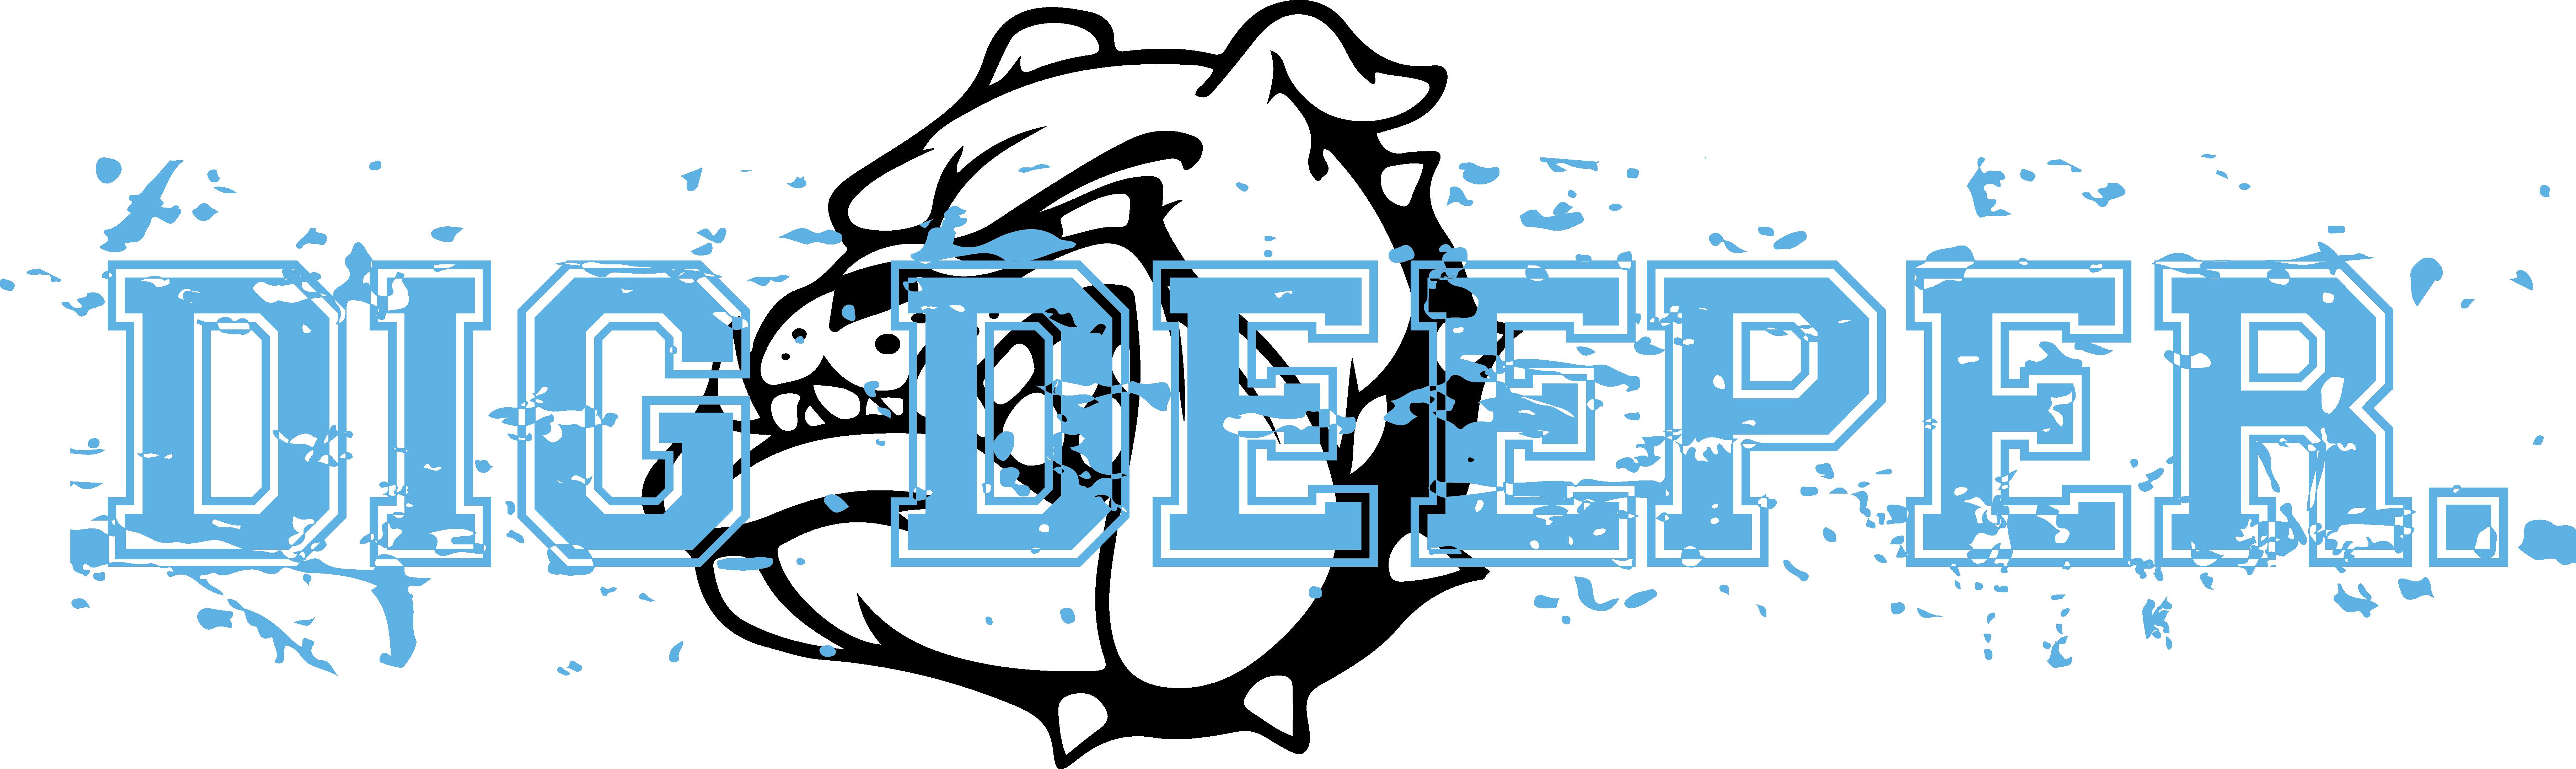 Dig Deeper - THS logo